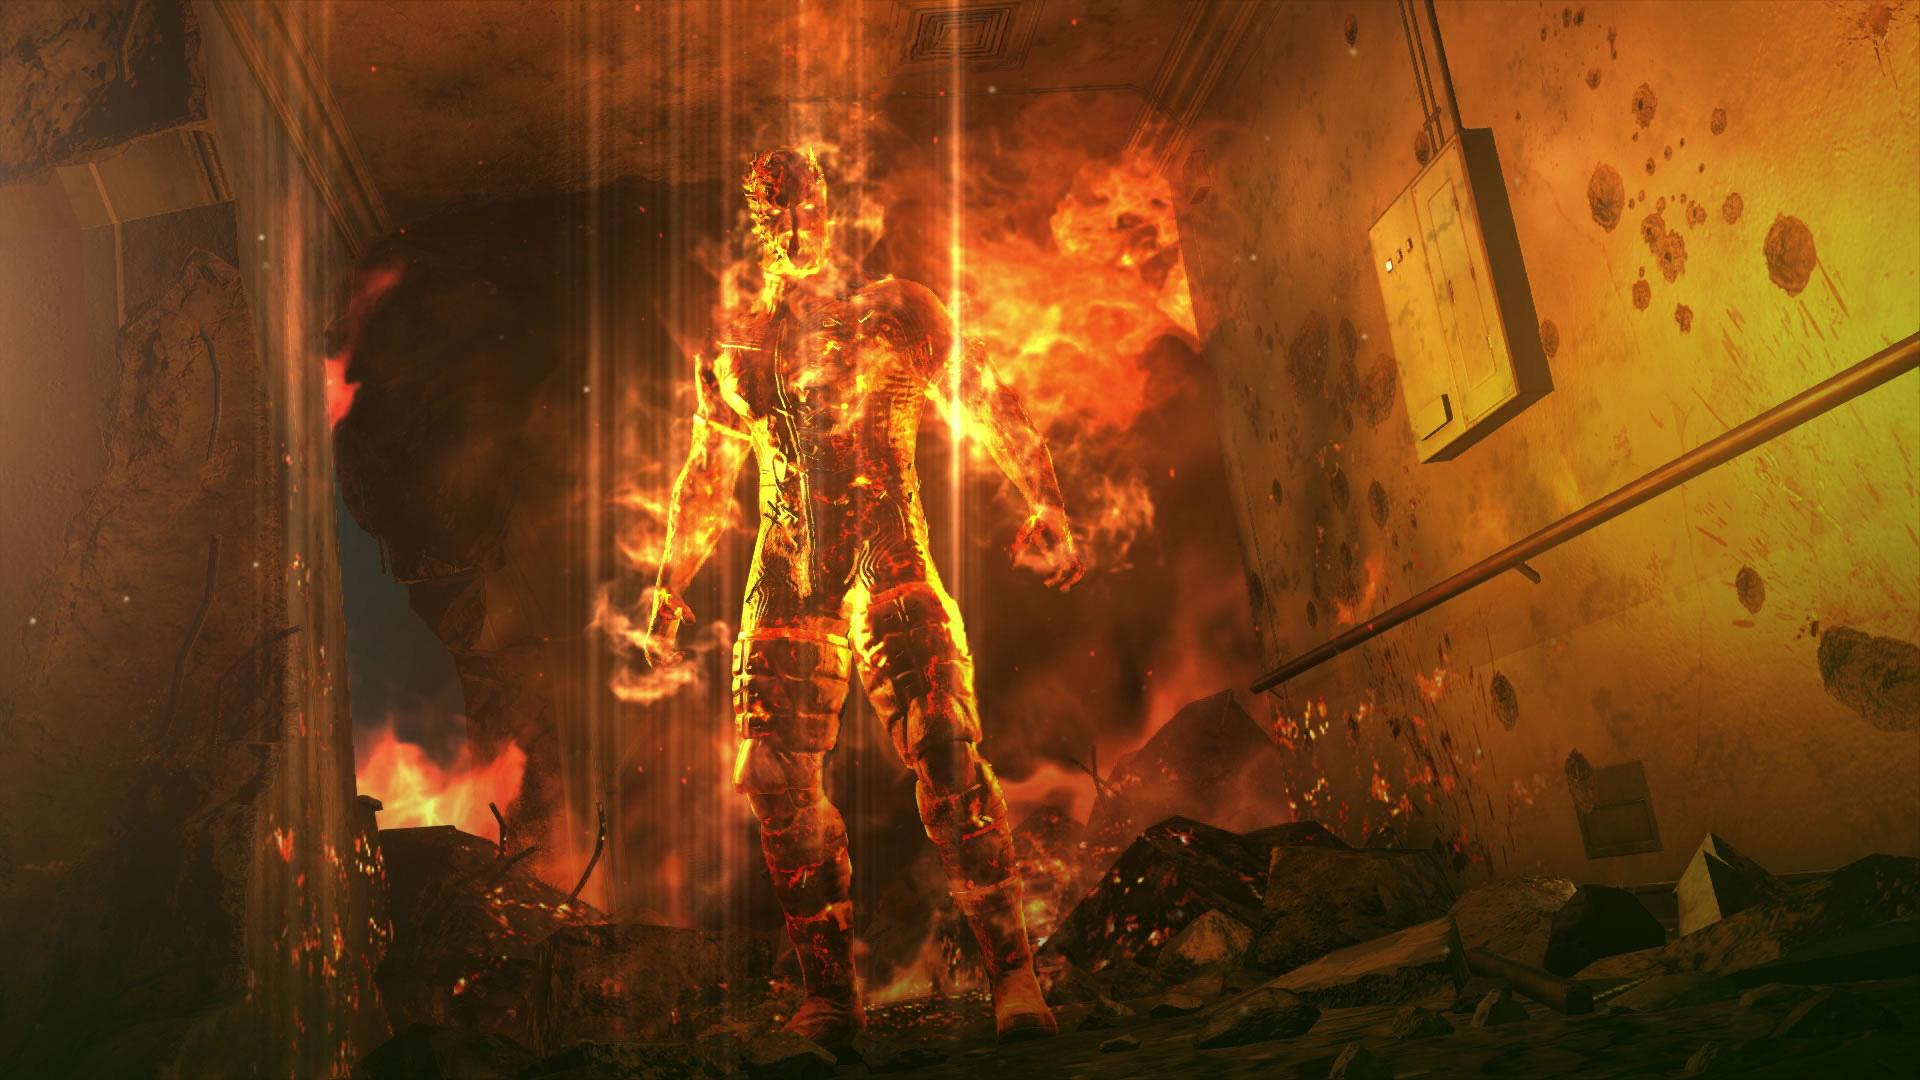 Metal-Gear-Solid-V-The-Phantom-Pain-E3-2015-Screen-Man-on-Fire